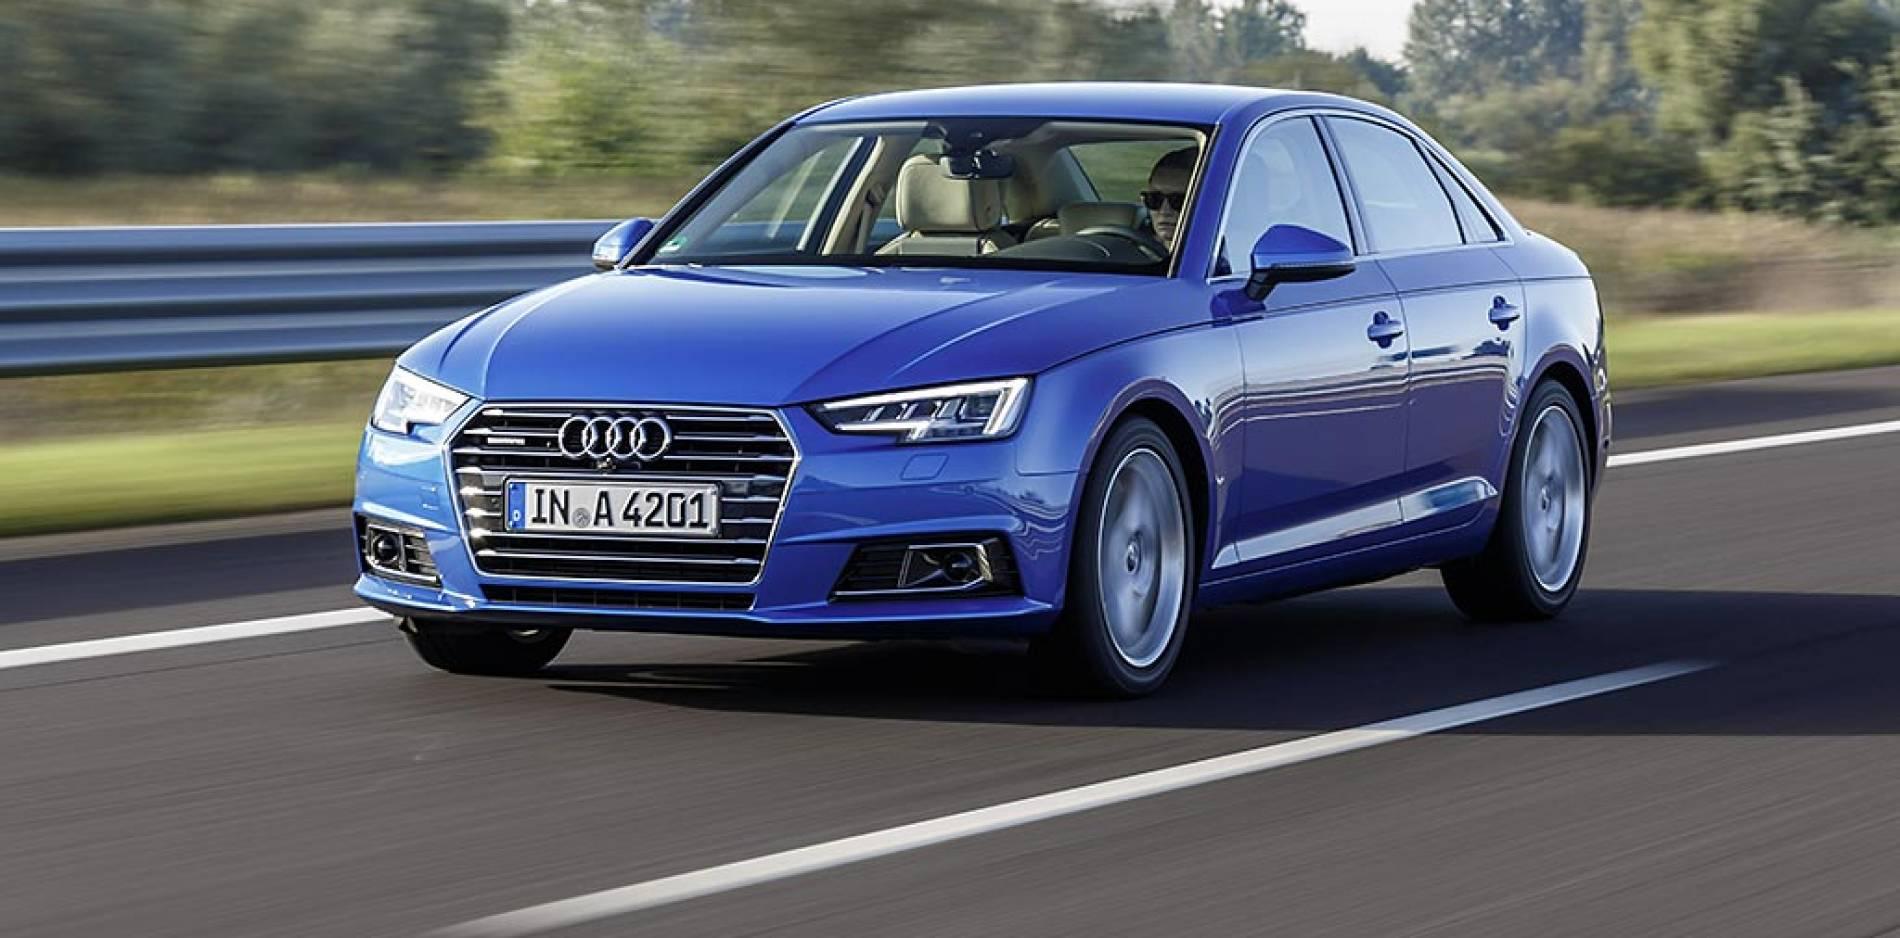 Nuevo Audi A4, probamos una berlina única